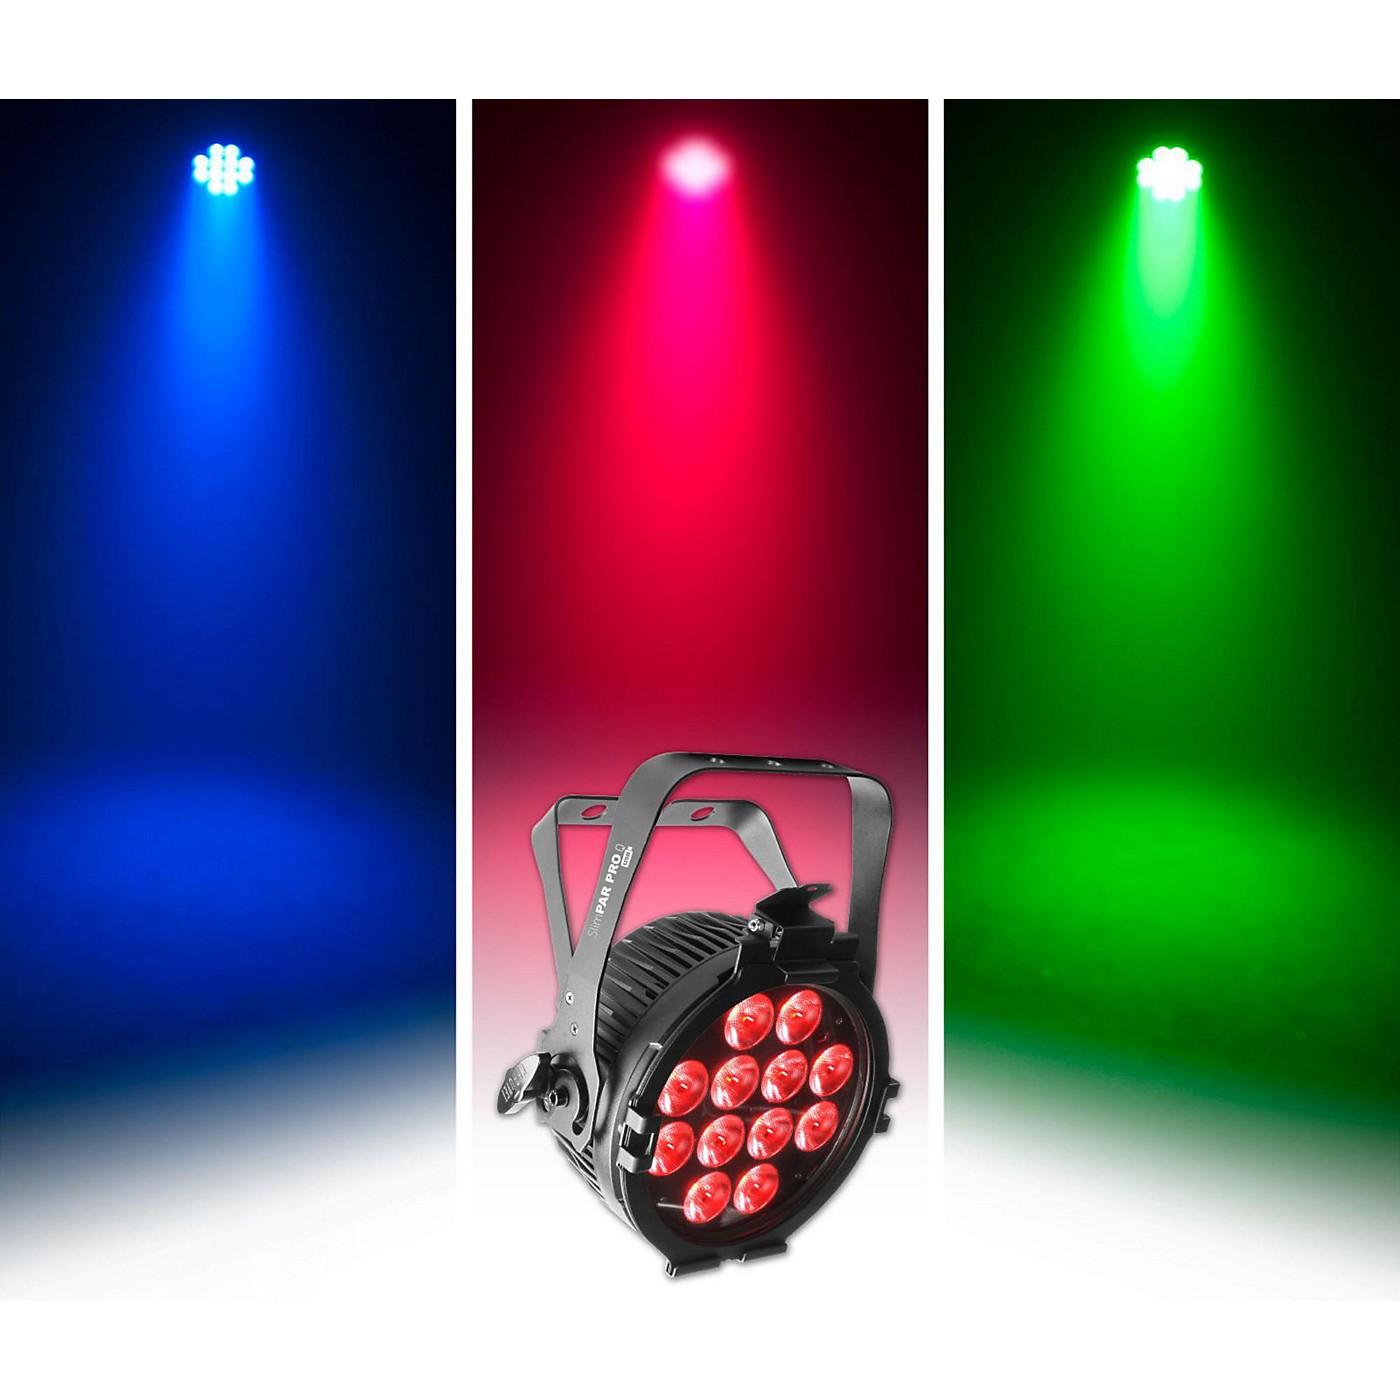 CHAUVET DJ SlimPAR Pro Q USB Quad Color LED Wash Light thumbnail